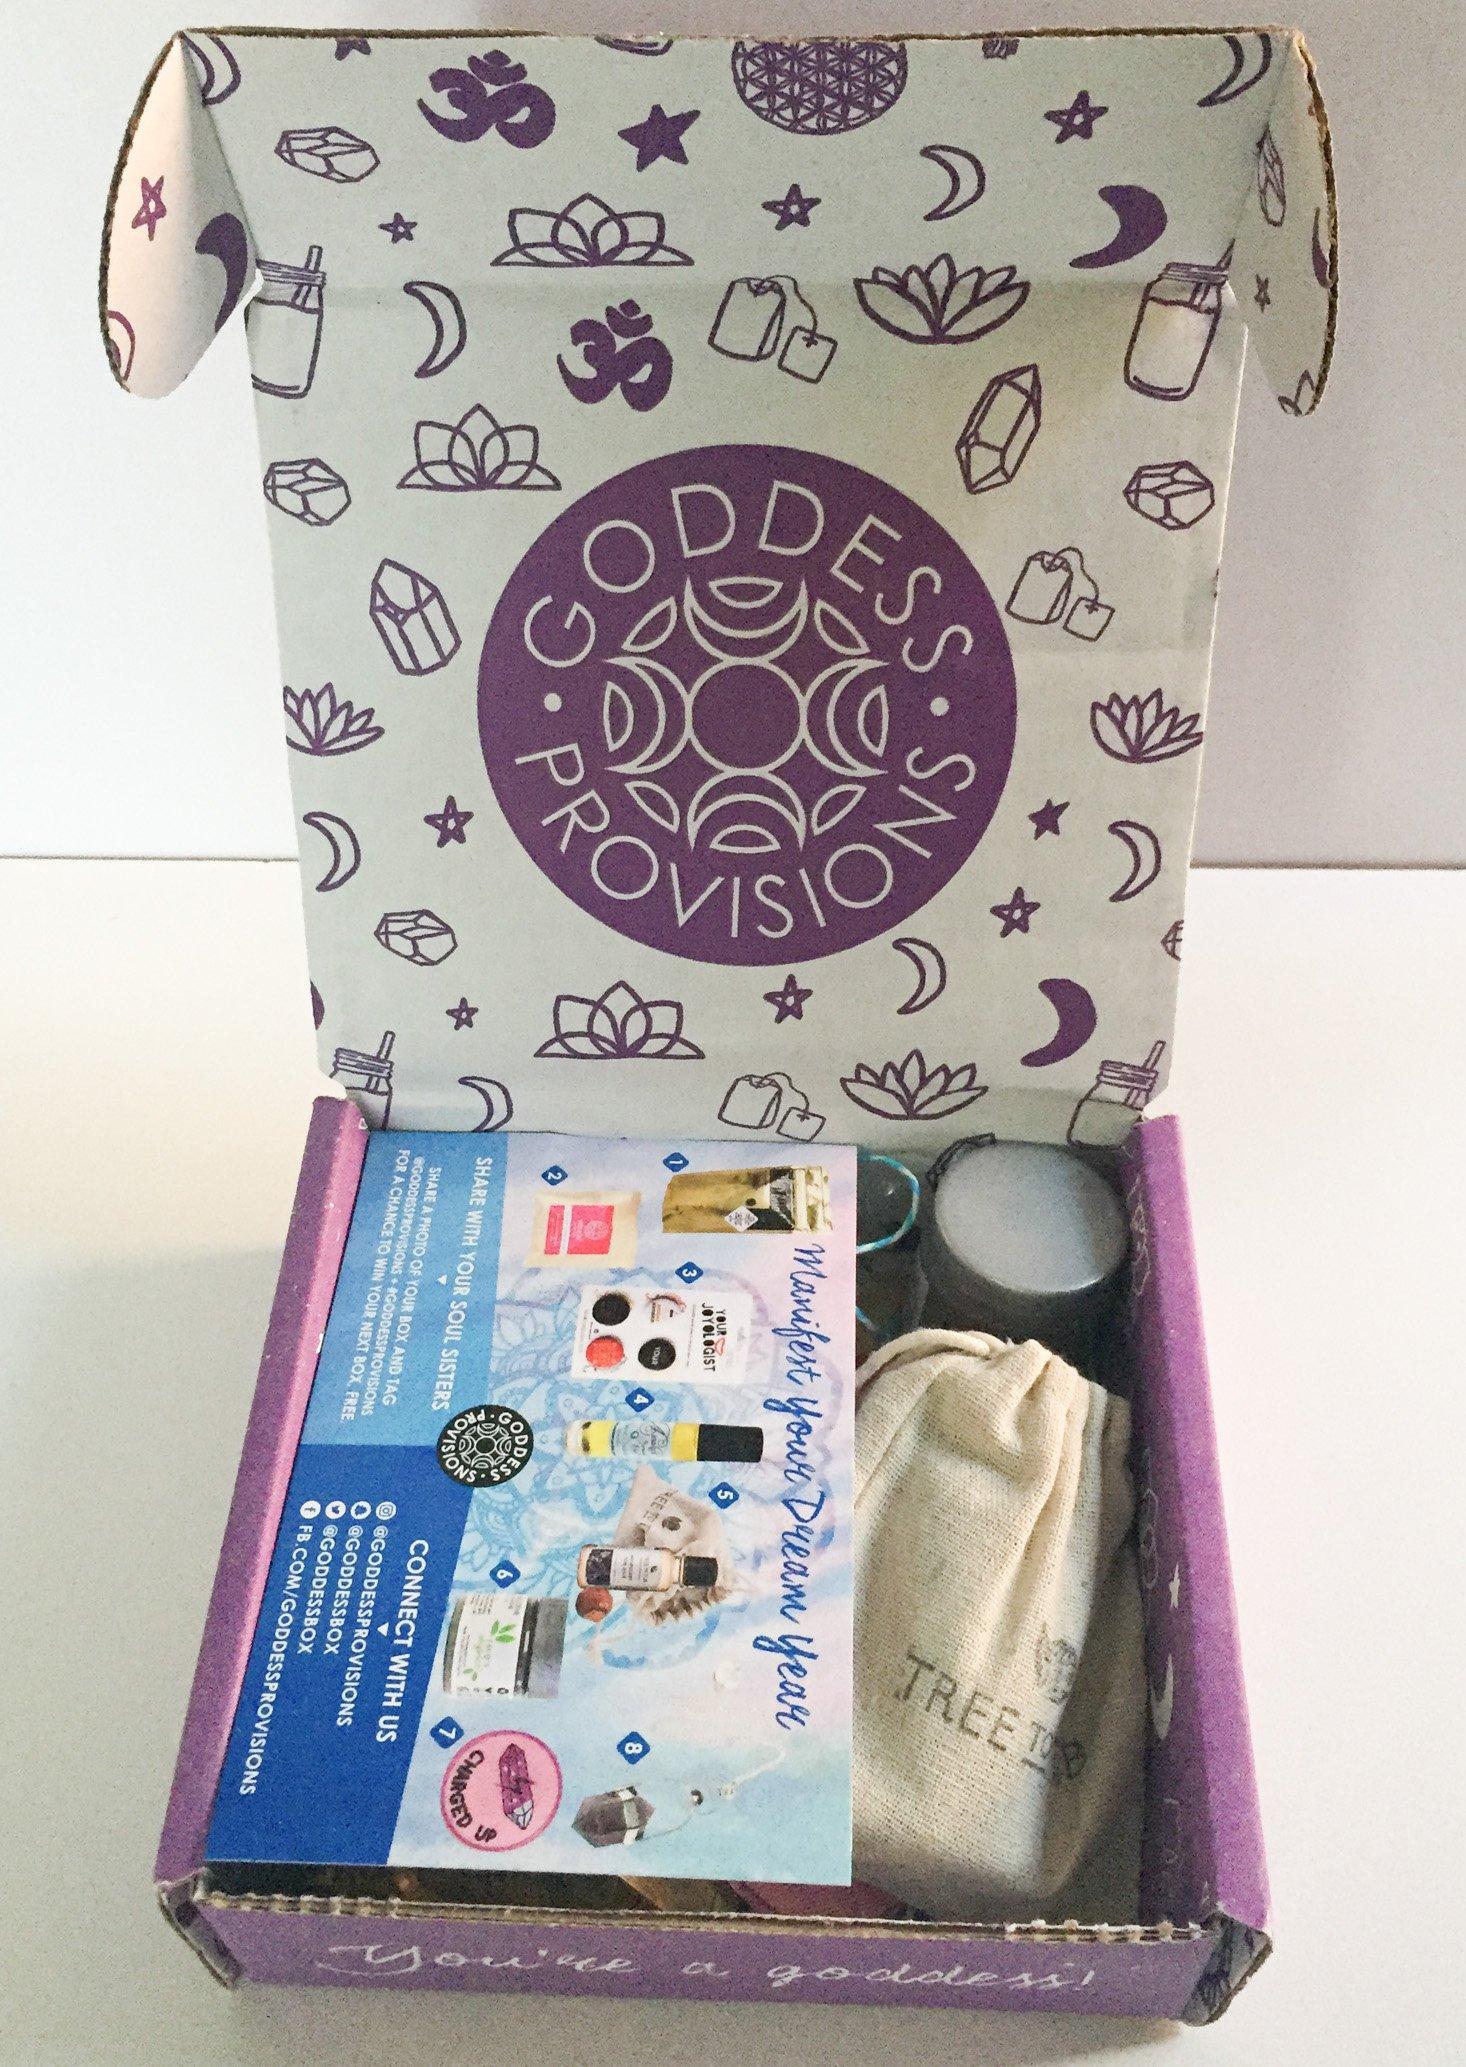 goddess-provisions-january-2017-box-inside